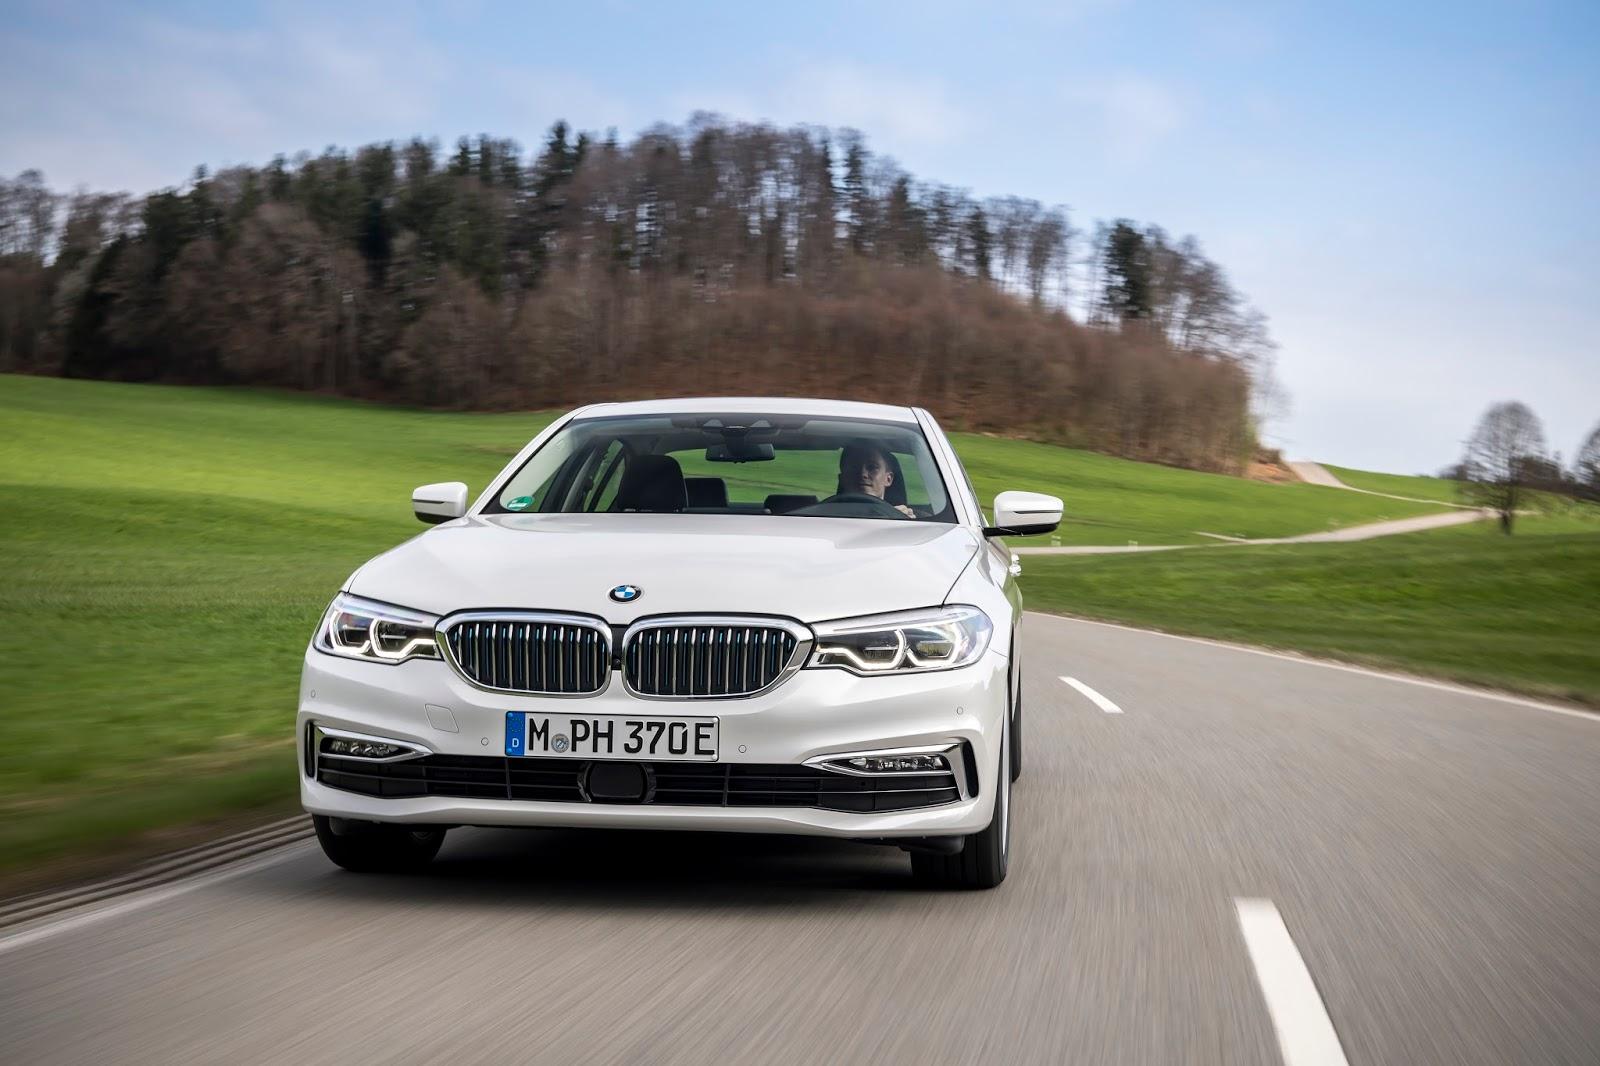 P90256349 highRes the new bmw 530e ipe Η BMW 530e iPerformance φέρνει την ηλεκτρική επανάσταση BMW, BMW 5, BMW 530e iPerformance, Electric cars, Hybrid, Λανσάρισμα